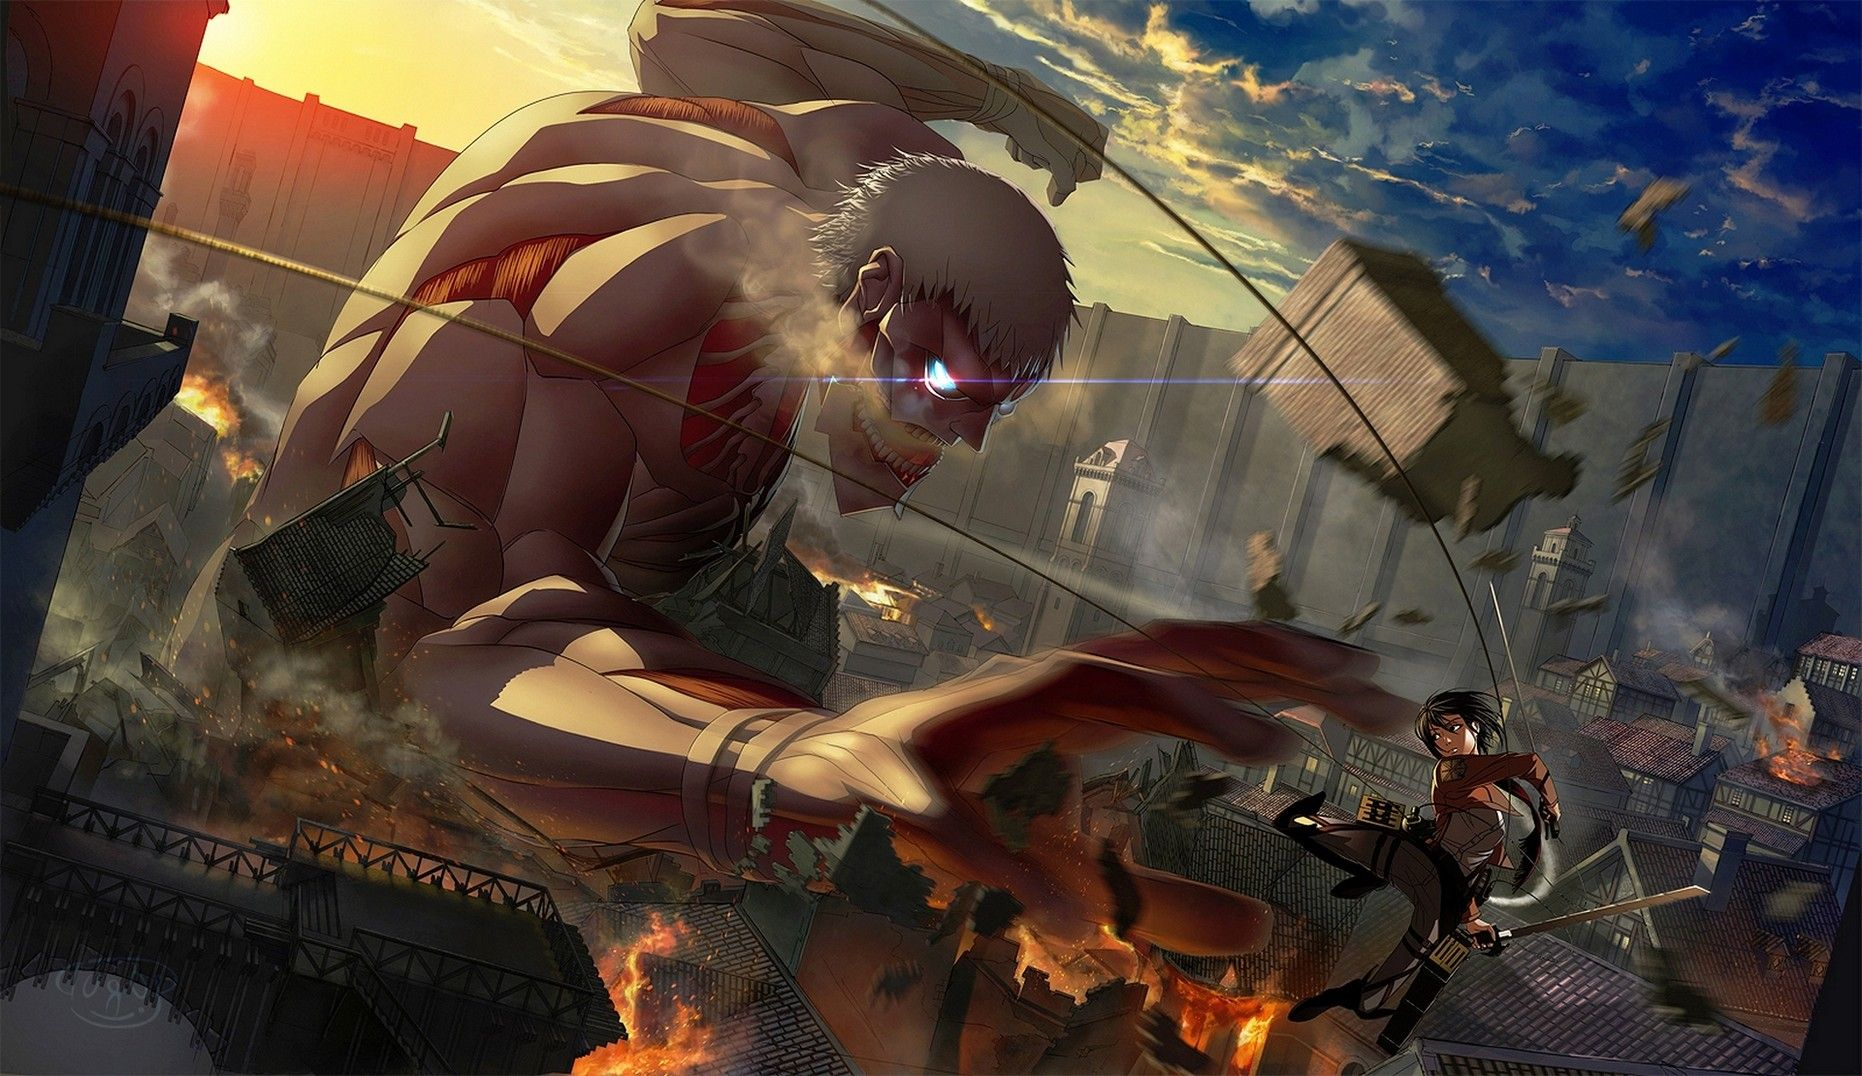 Shingeki No Kyojin Hd Desktop Wallpaper High Definition Attack On Titan Season Attack On Titan Art Attack On Titan